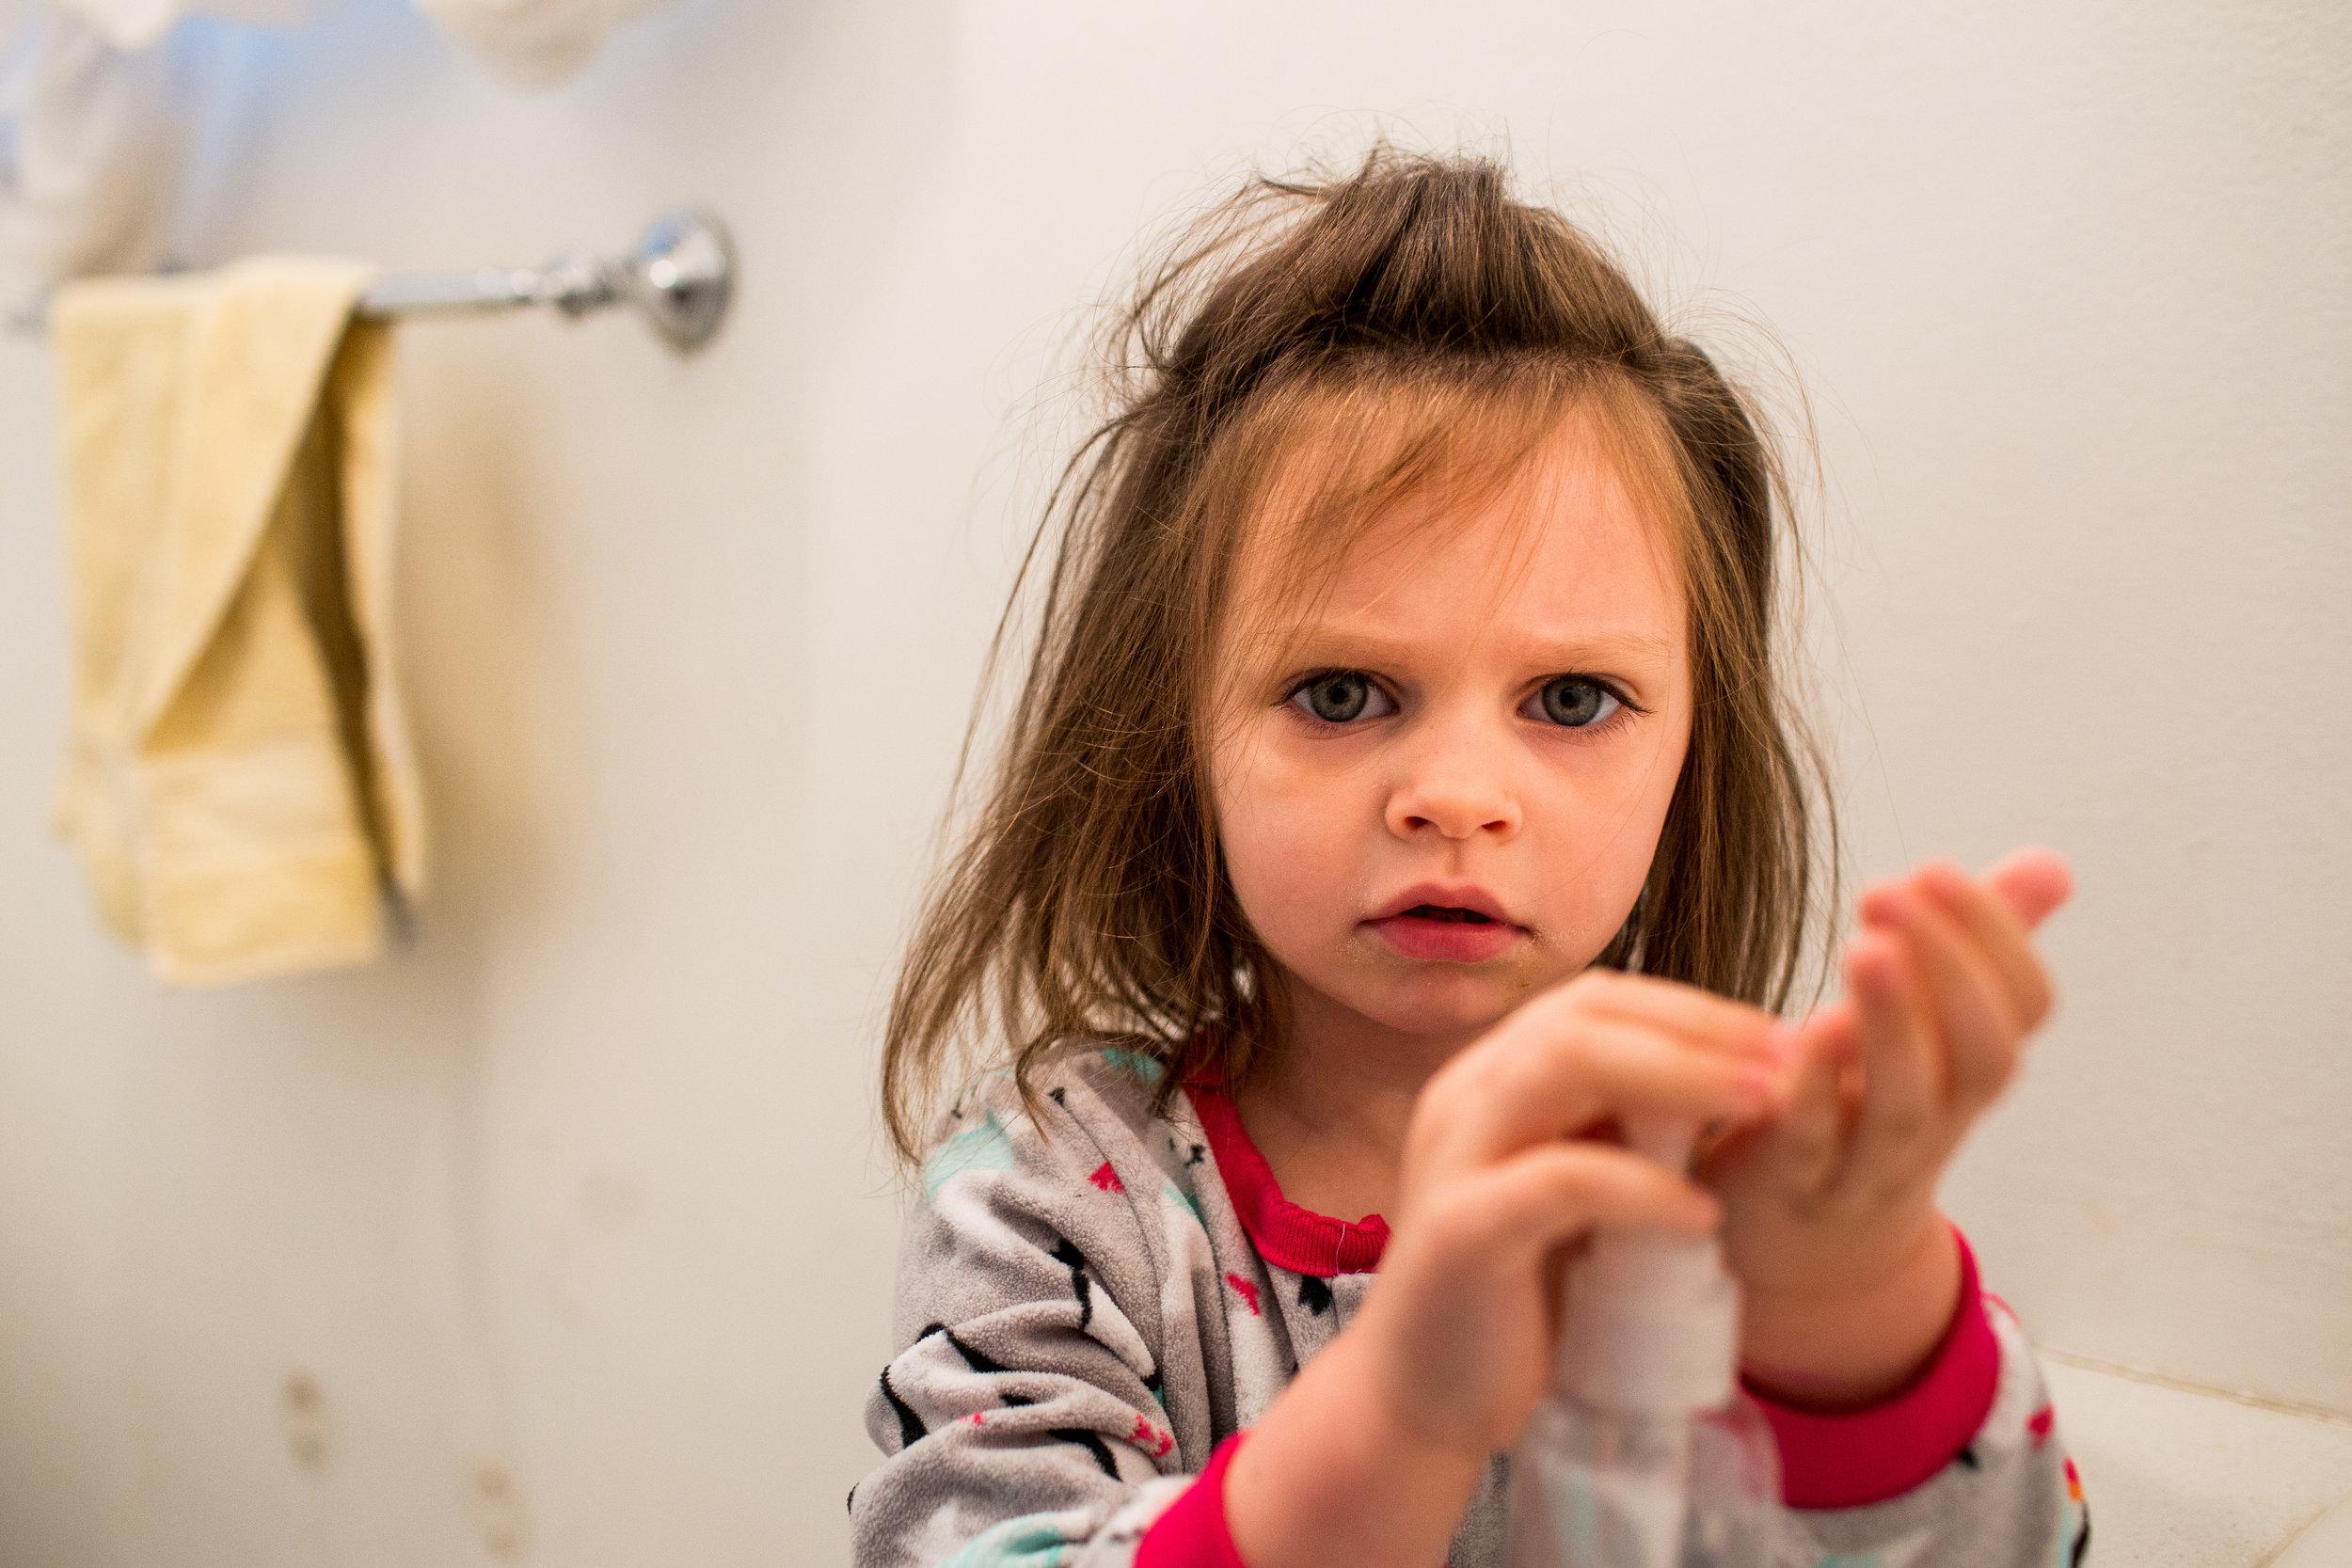 Little girl getting soap